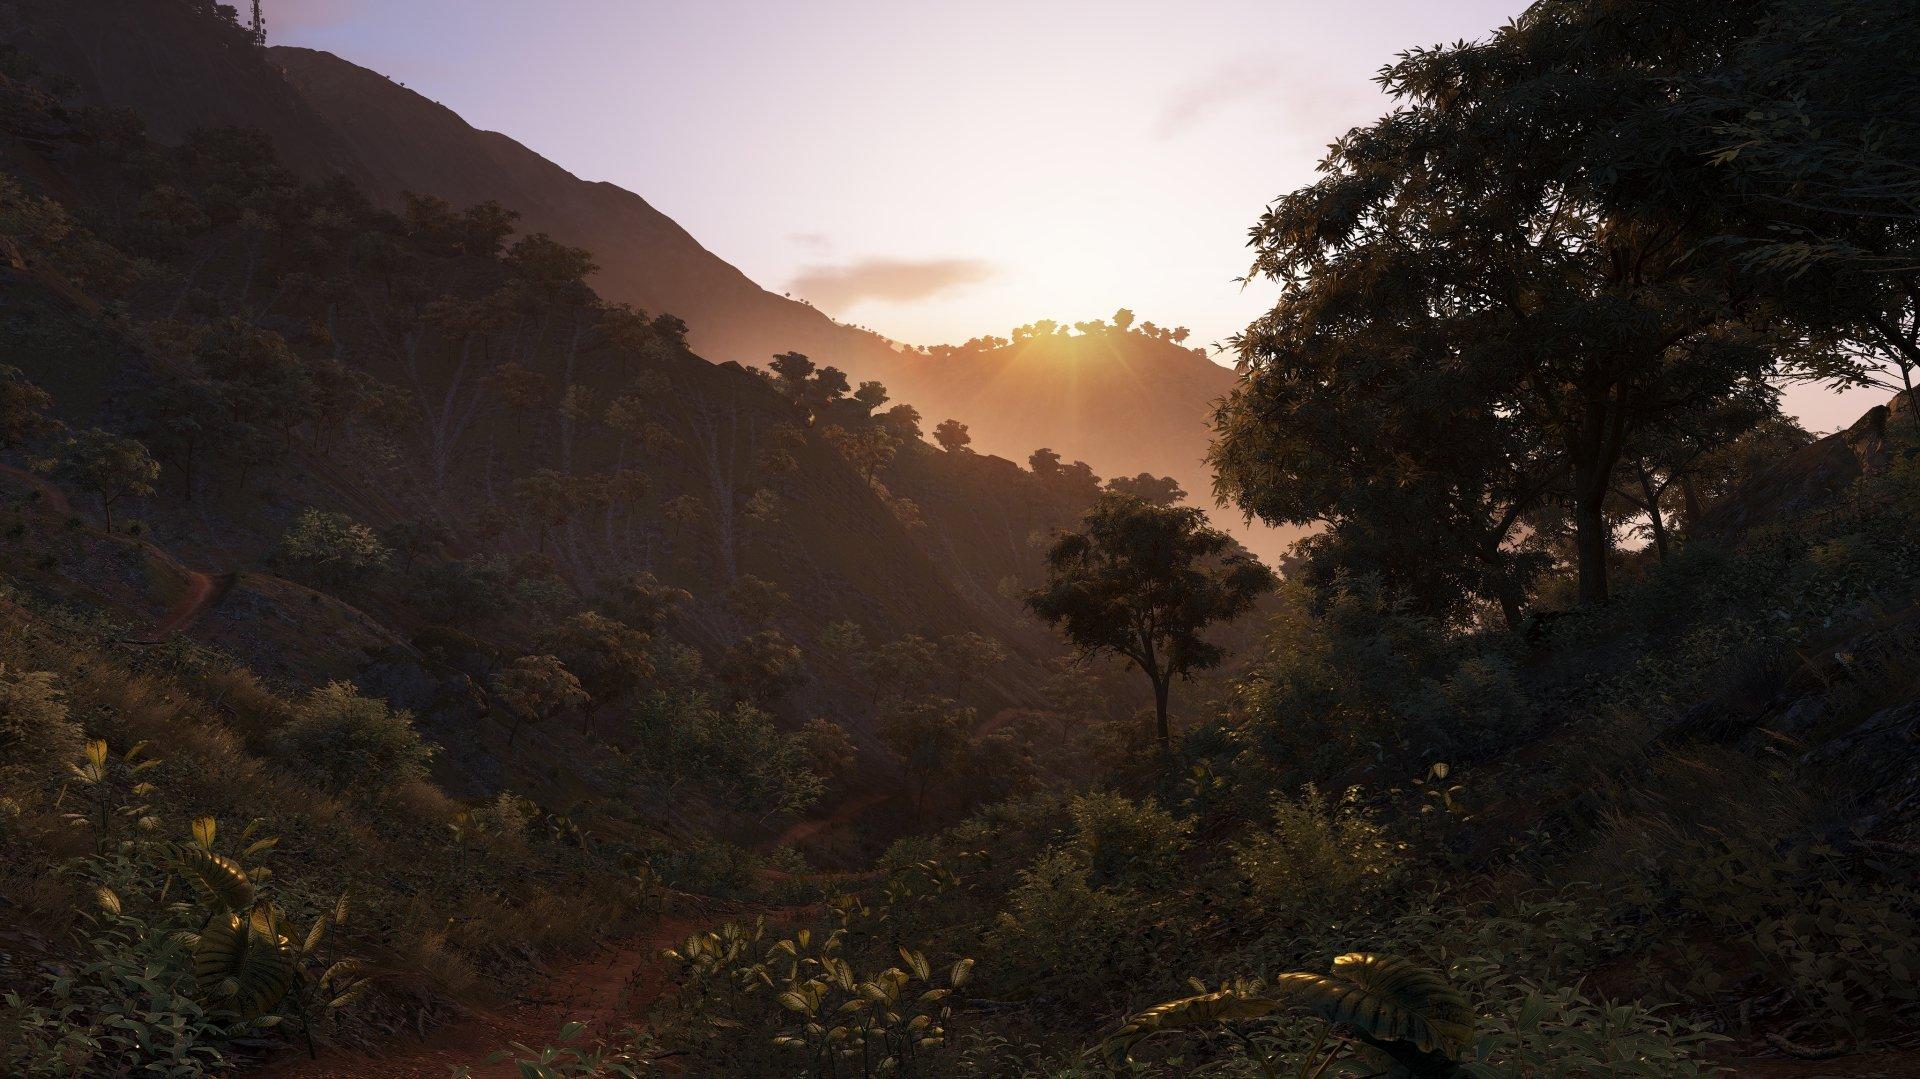 Villa verde 4k ultra hd wallpaper background image - Ghost recon wildlands mobile wallpaper ...